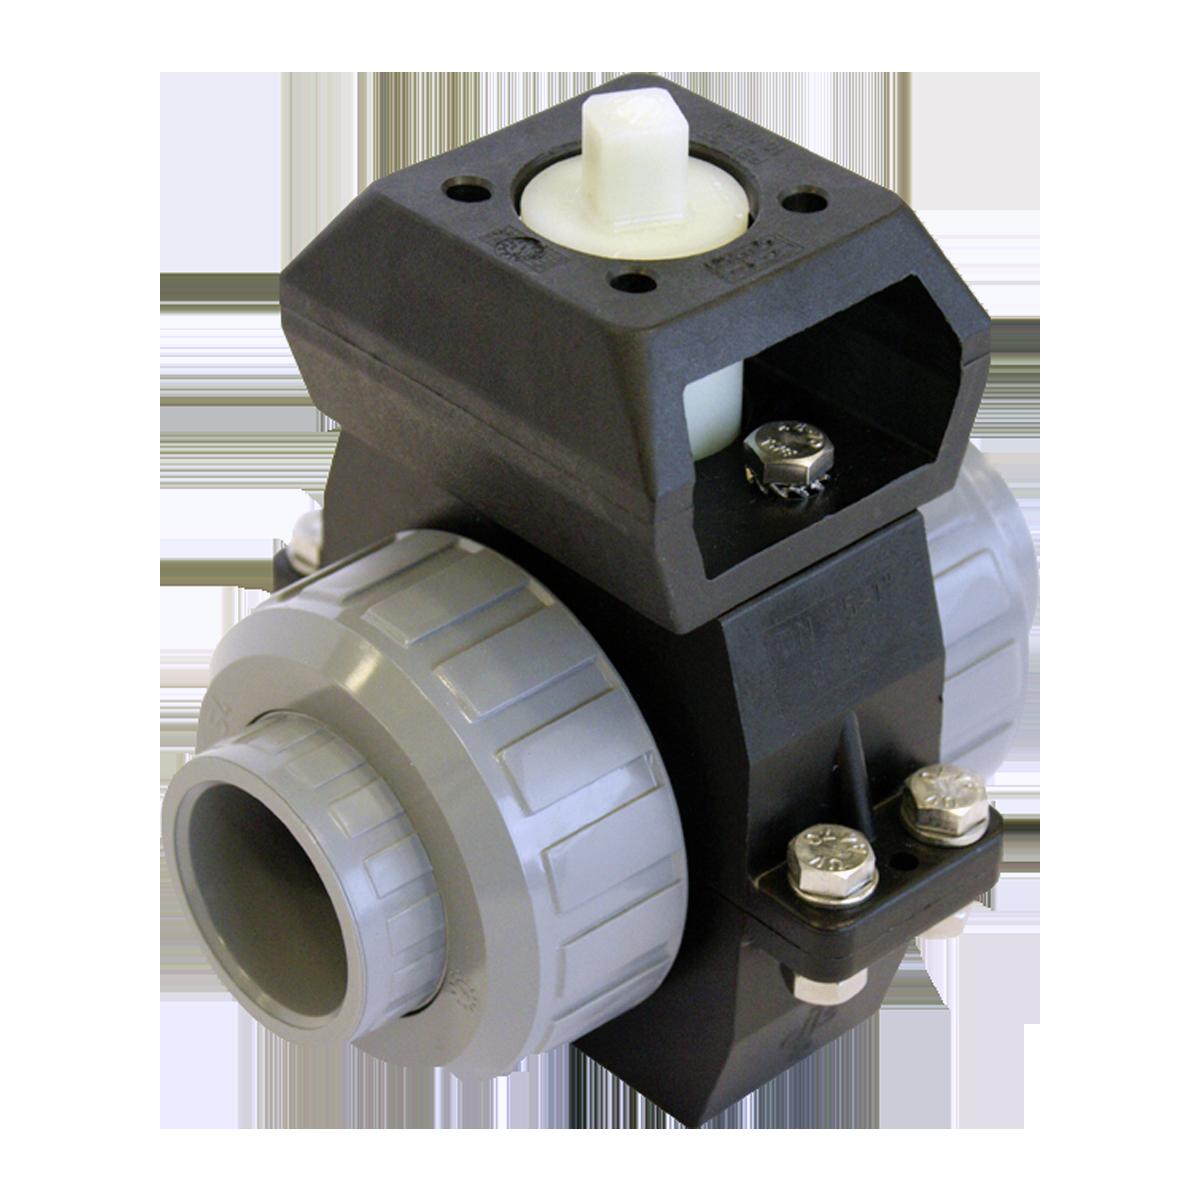 Praher 2-way ball valve S4 PVC-C with adapter set, grey, black